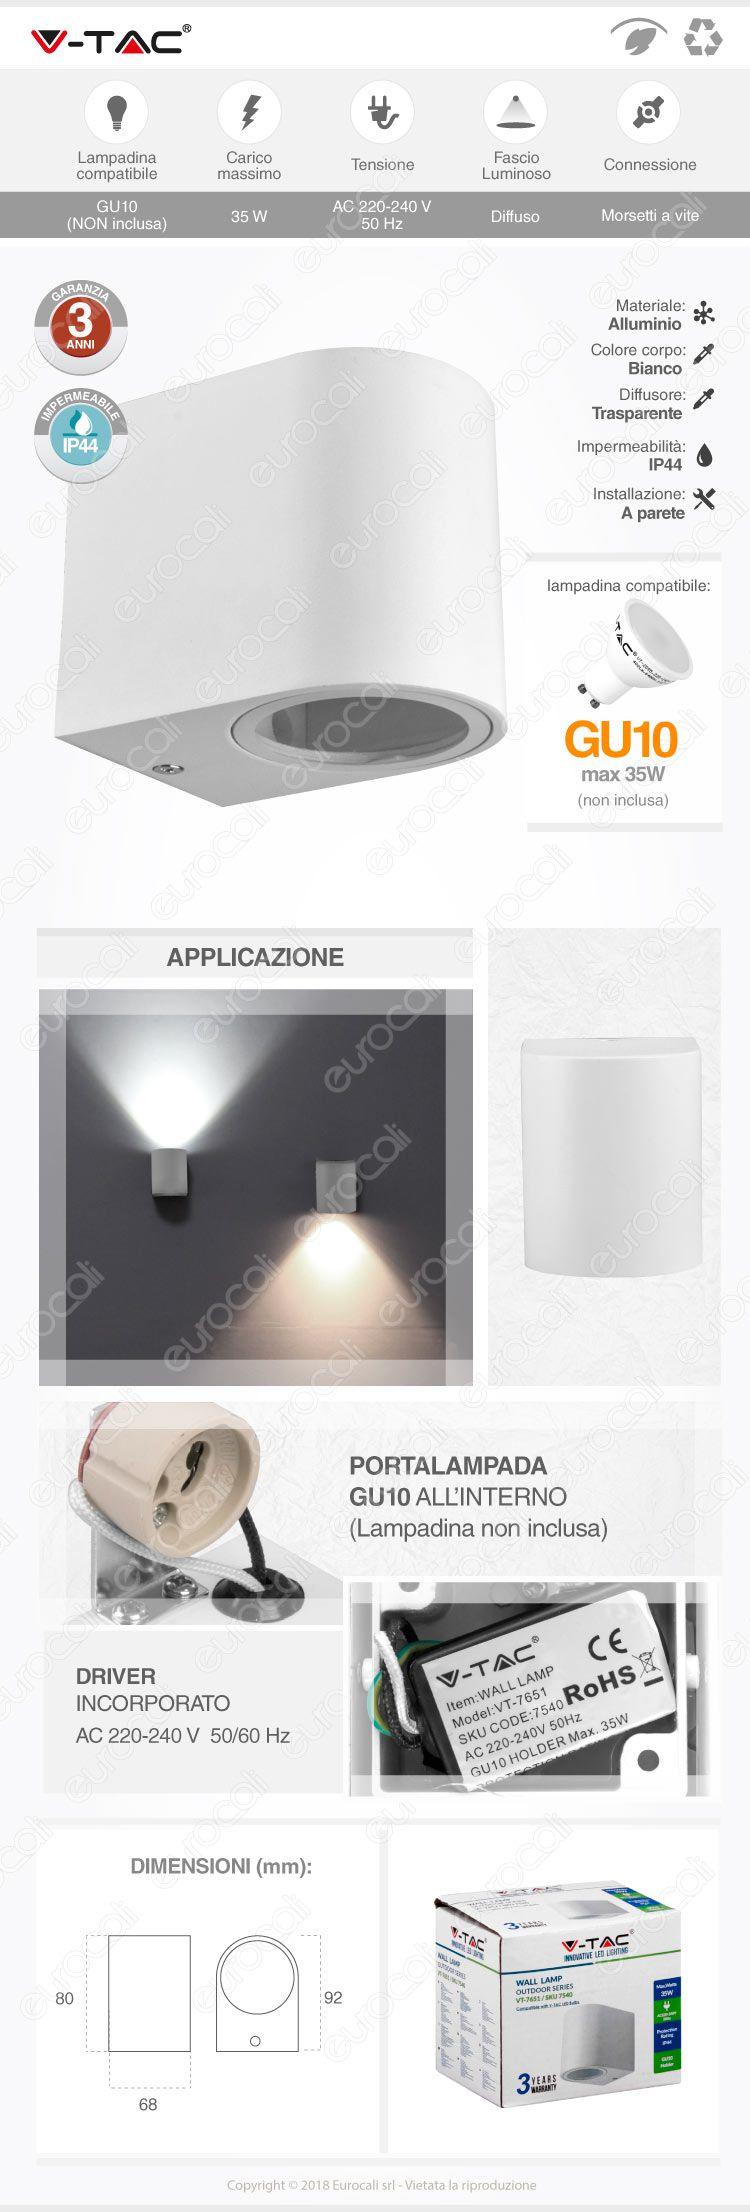 wall light gu10 v-tac